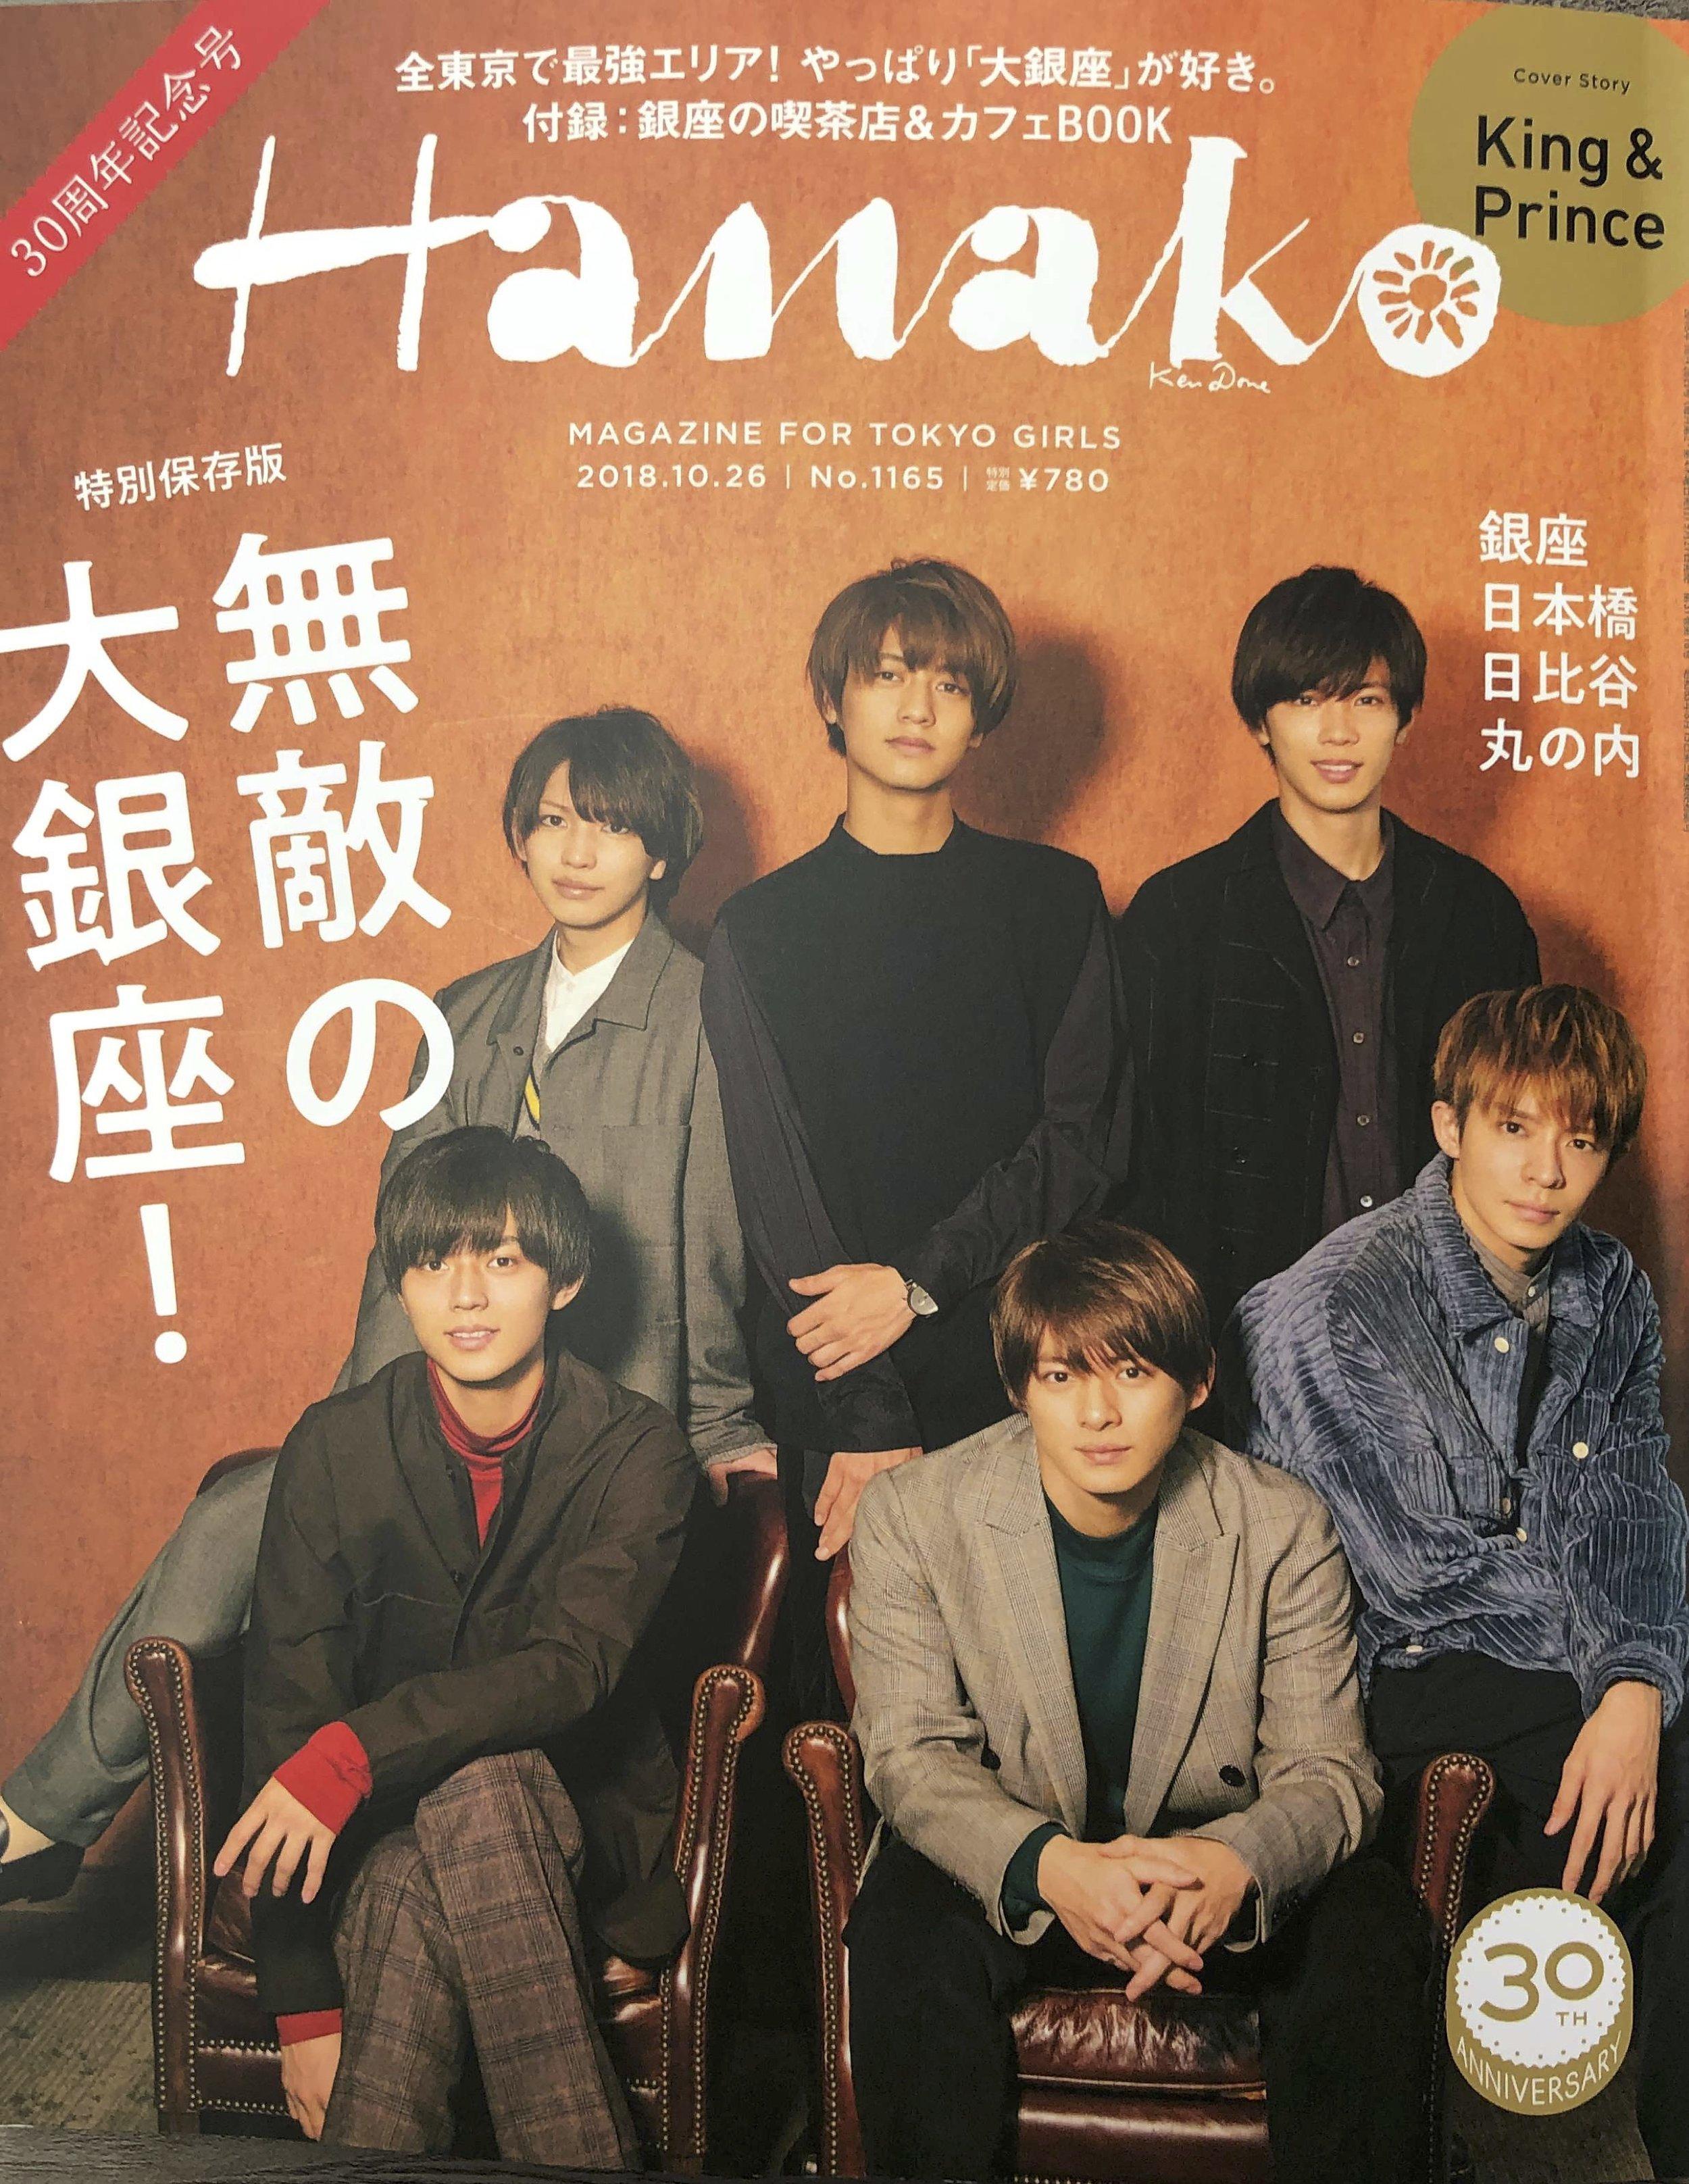 Hanako Magazine Cover October